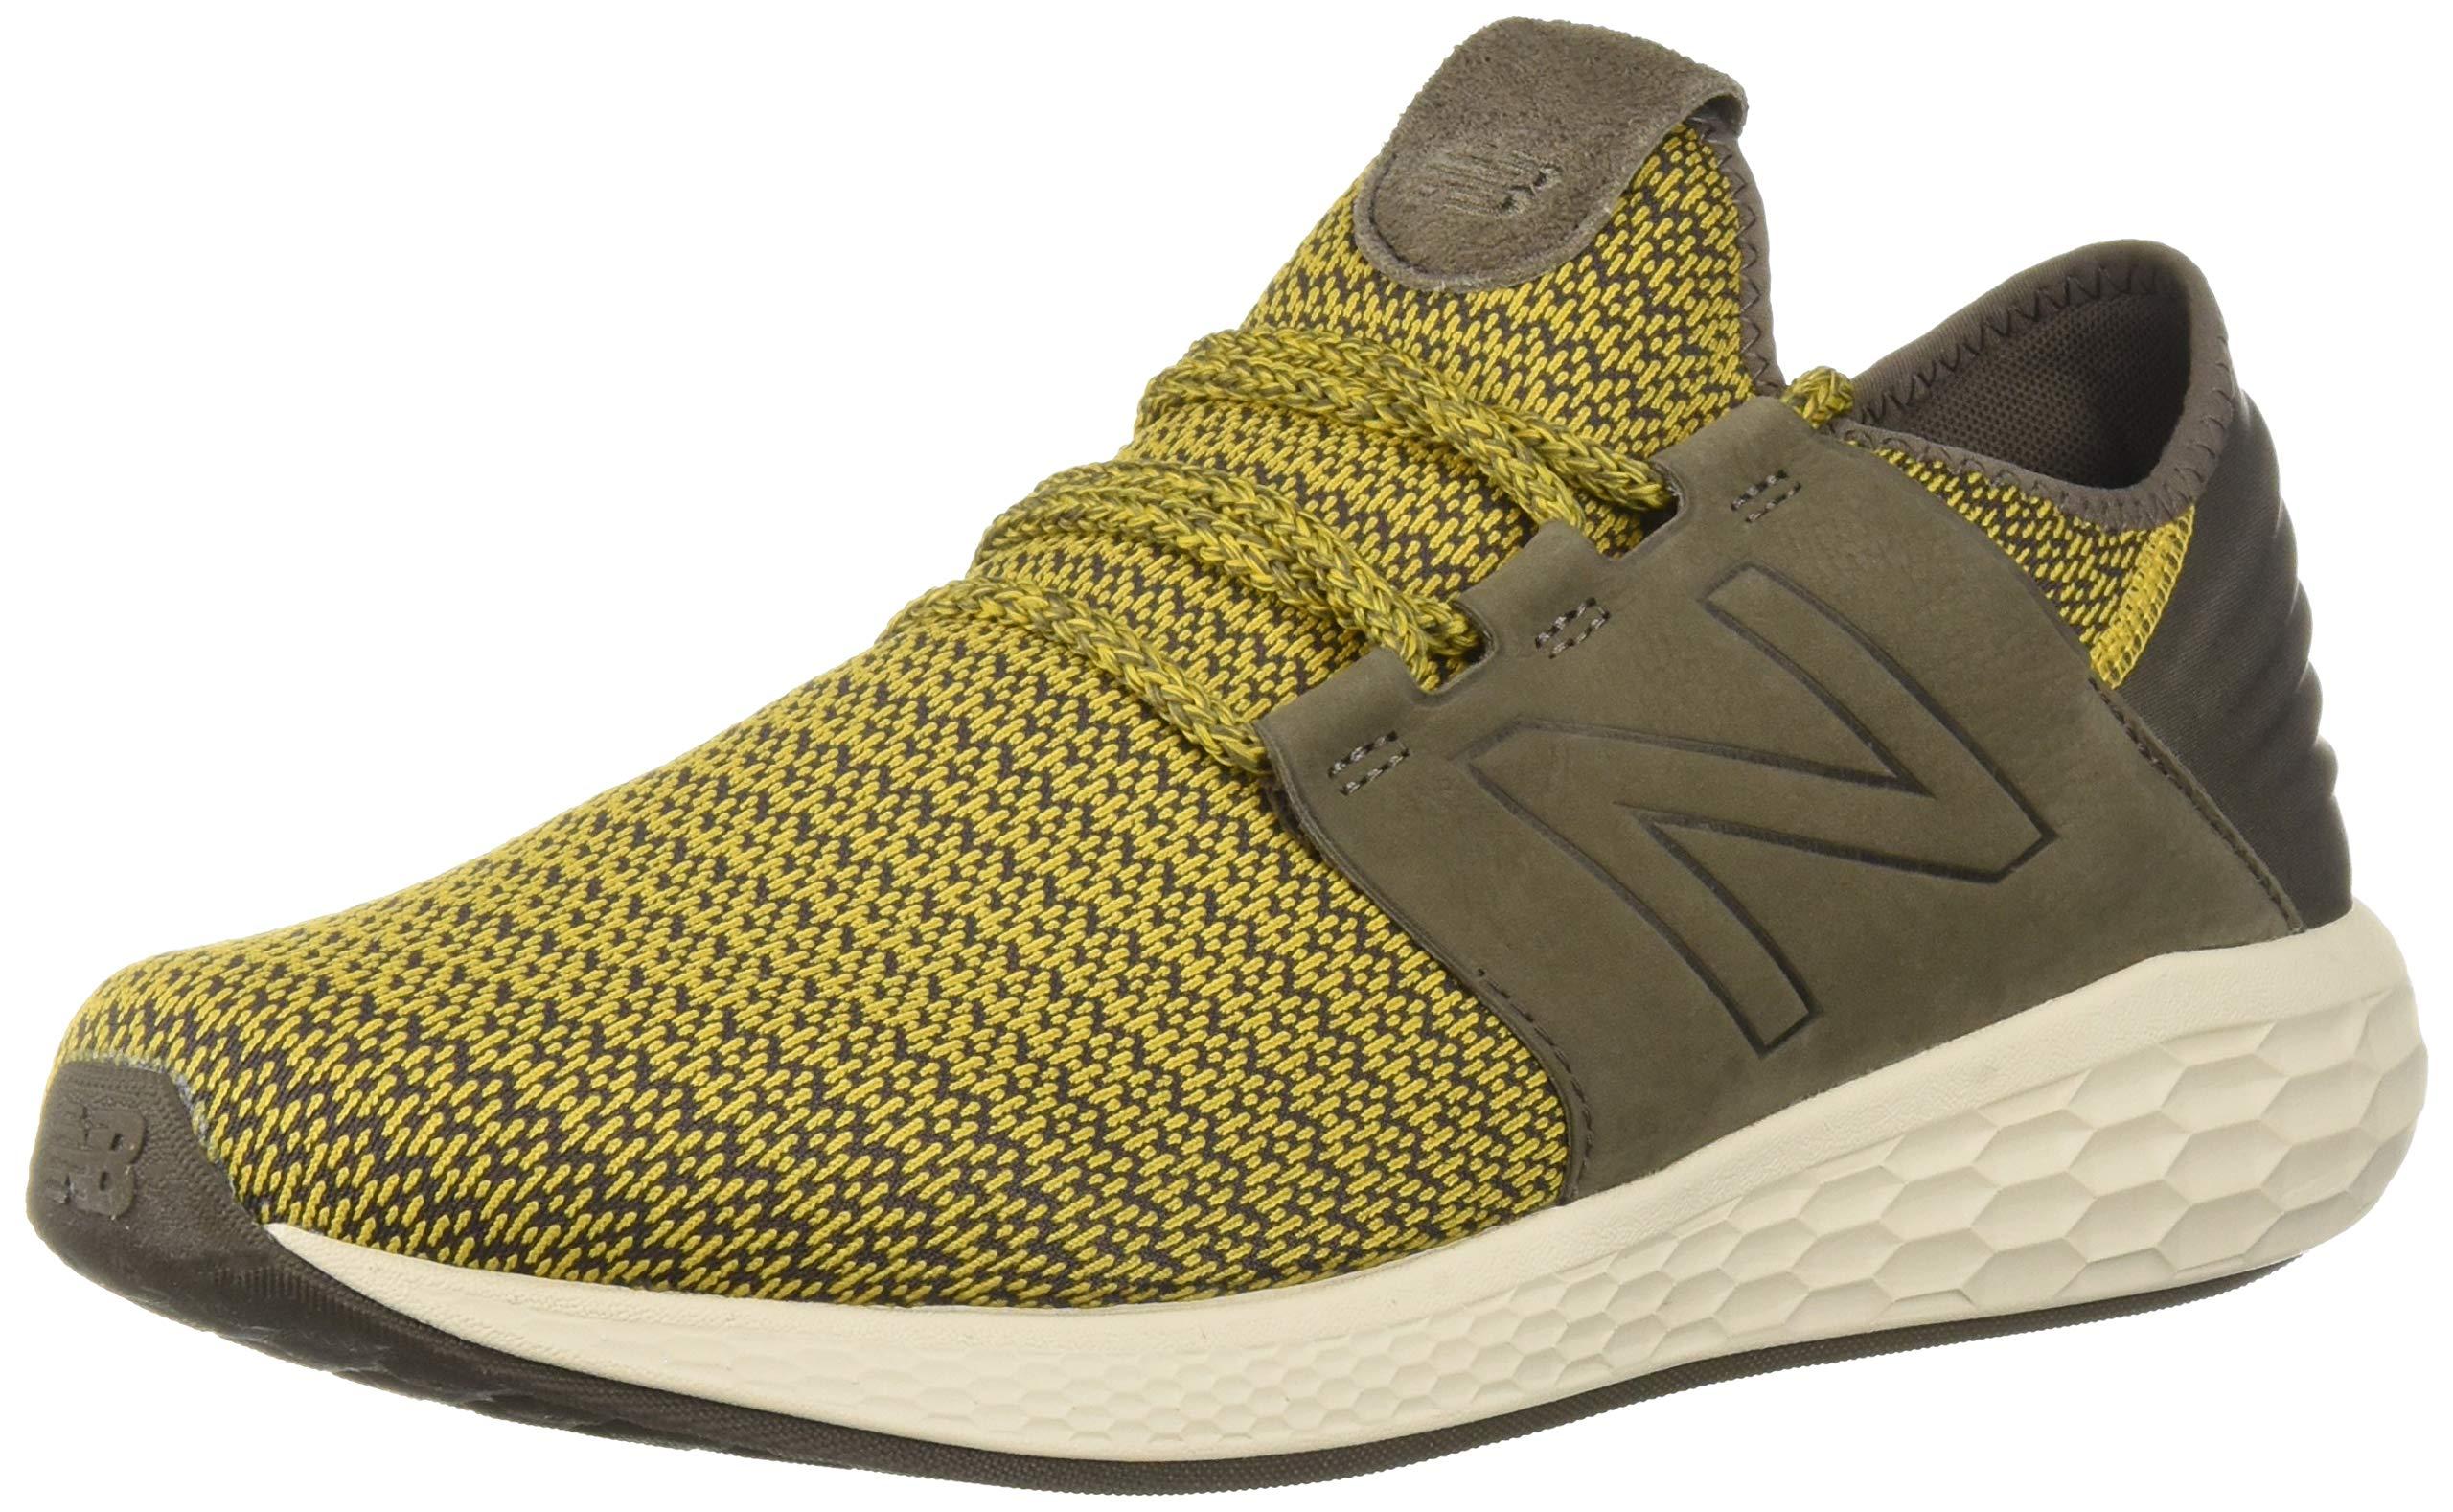 New Balance Men's Cruz V2 Fresh Foam Running Shoe, sunflower/light chalk board/birch, 10.5 2E US by New Balance